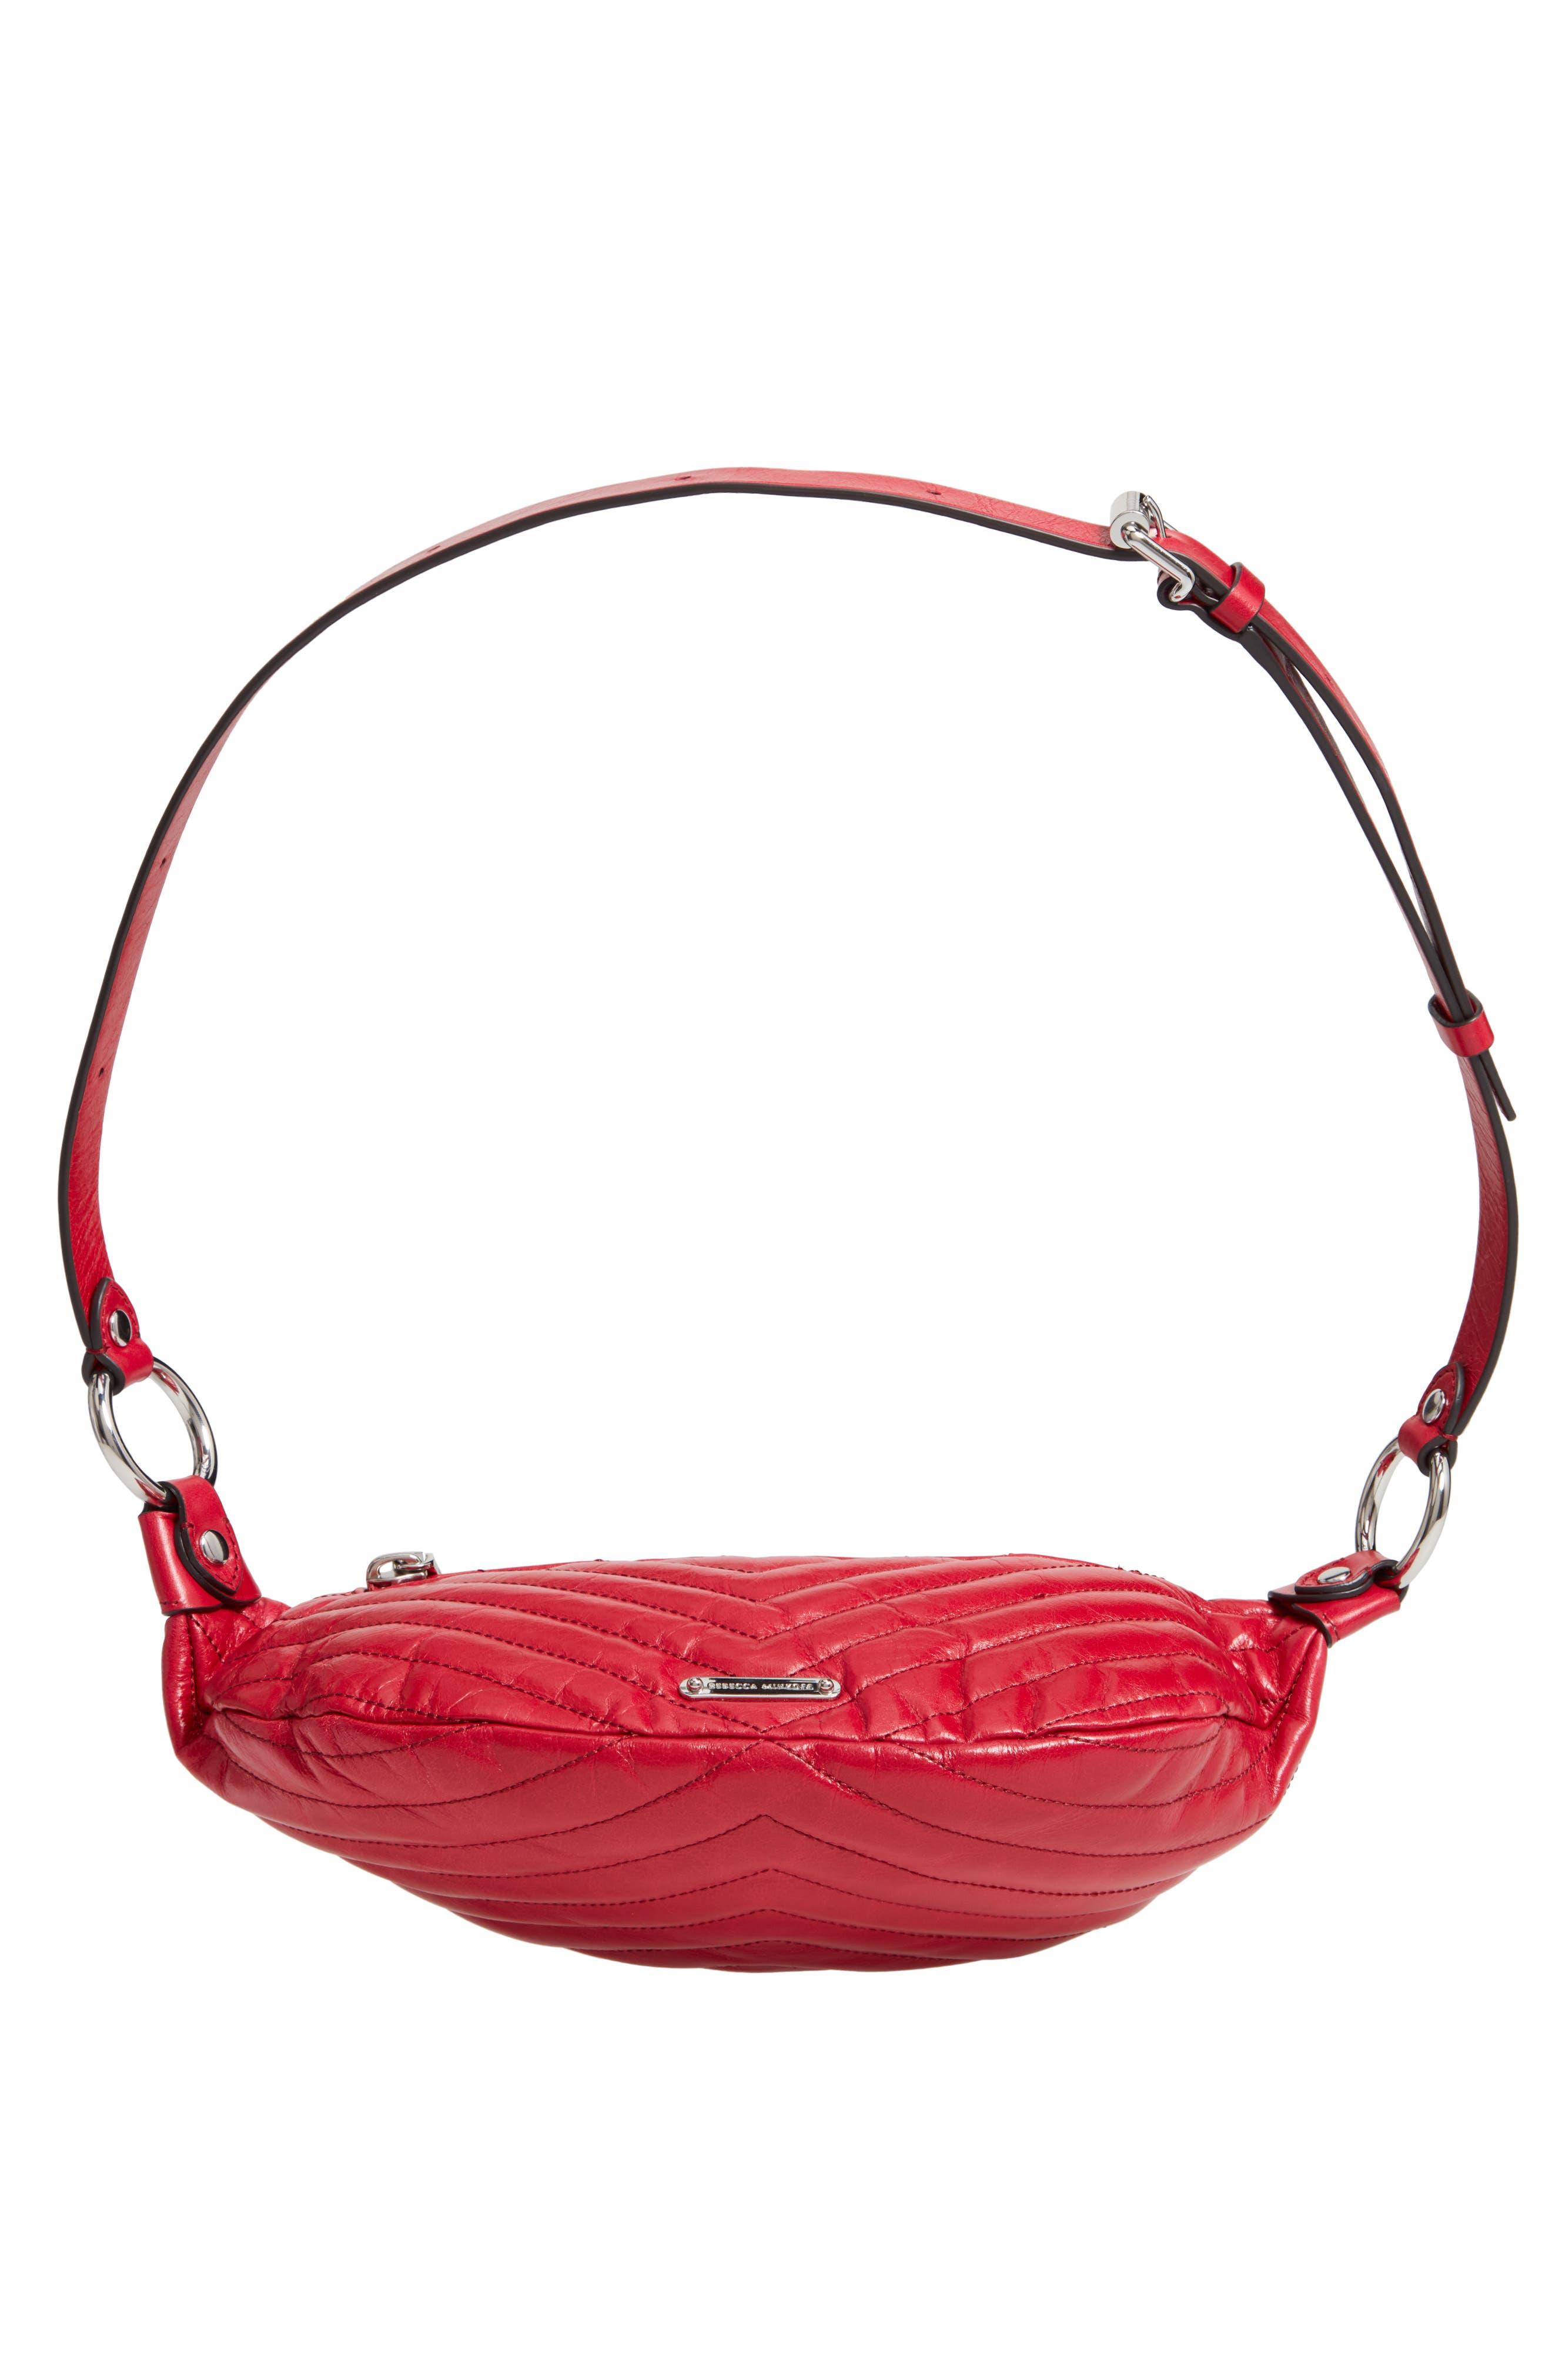 Edie Leather Belt Bag,                             Alternate thumbnail 7, color,                             SCARLET